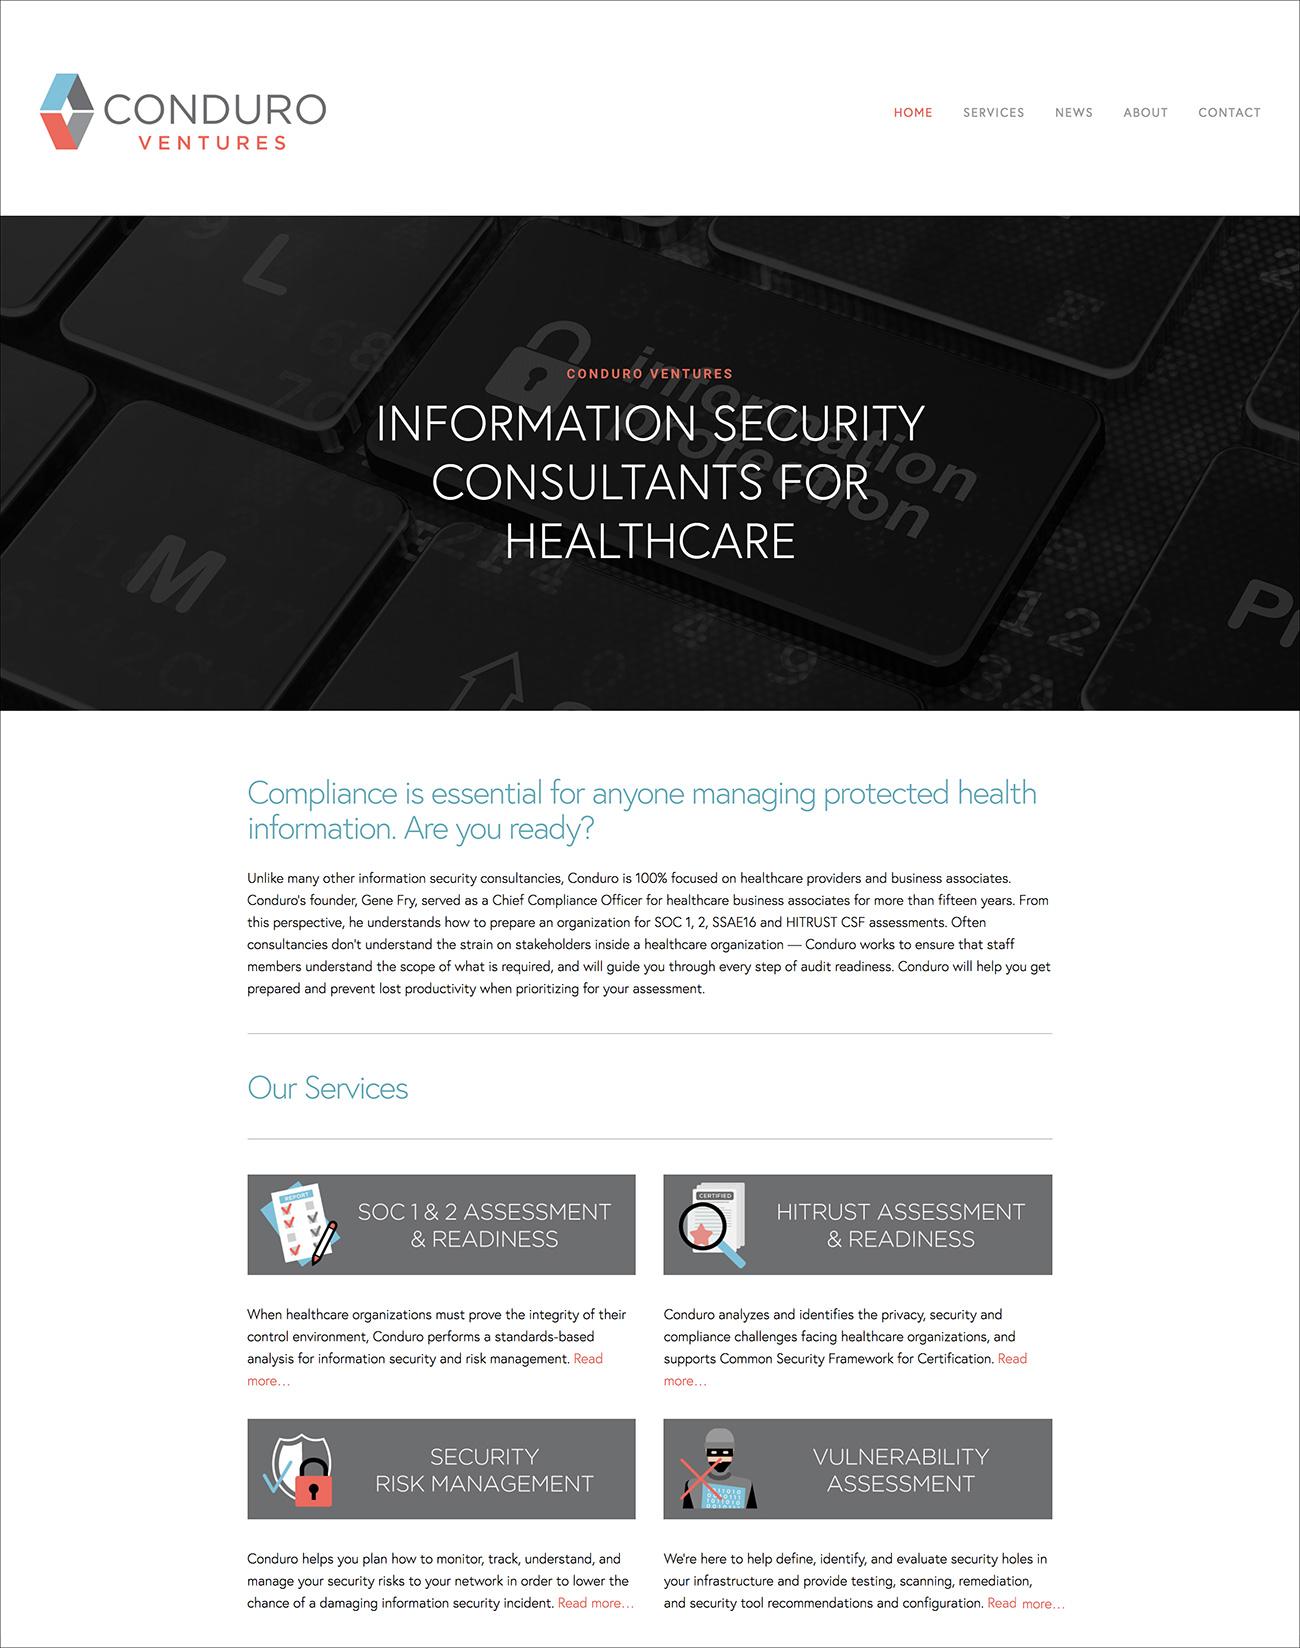 Conduro Ventures Website | Information Security Consultants for Healthcare, Soc1 and 2, HiTrust, Risk Management, HIPPA Compliance, Austin, Texas | DesignCode | Austin, Texas